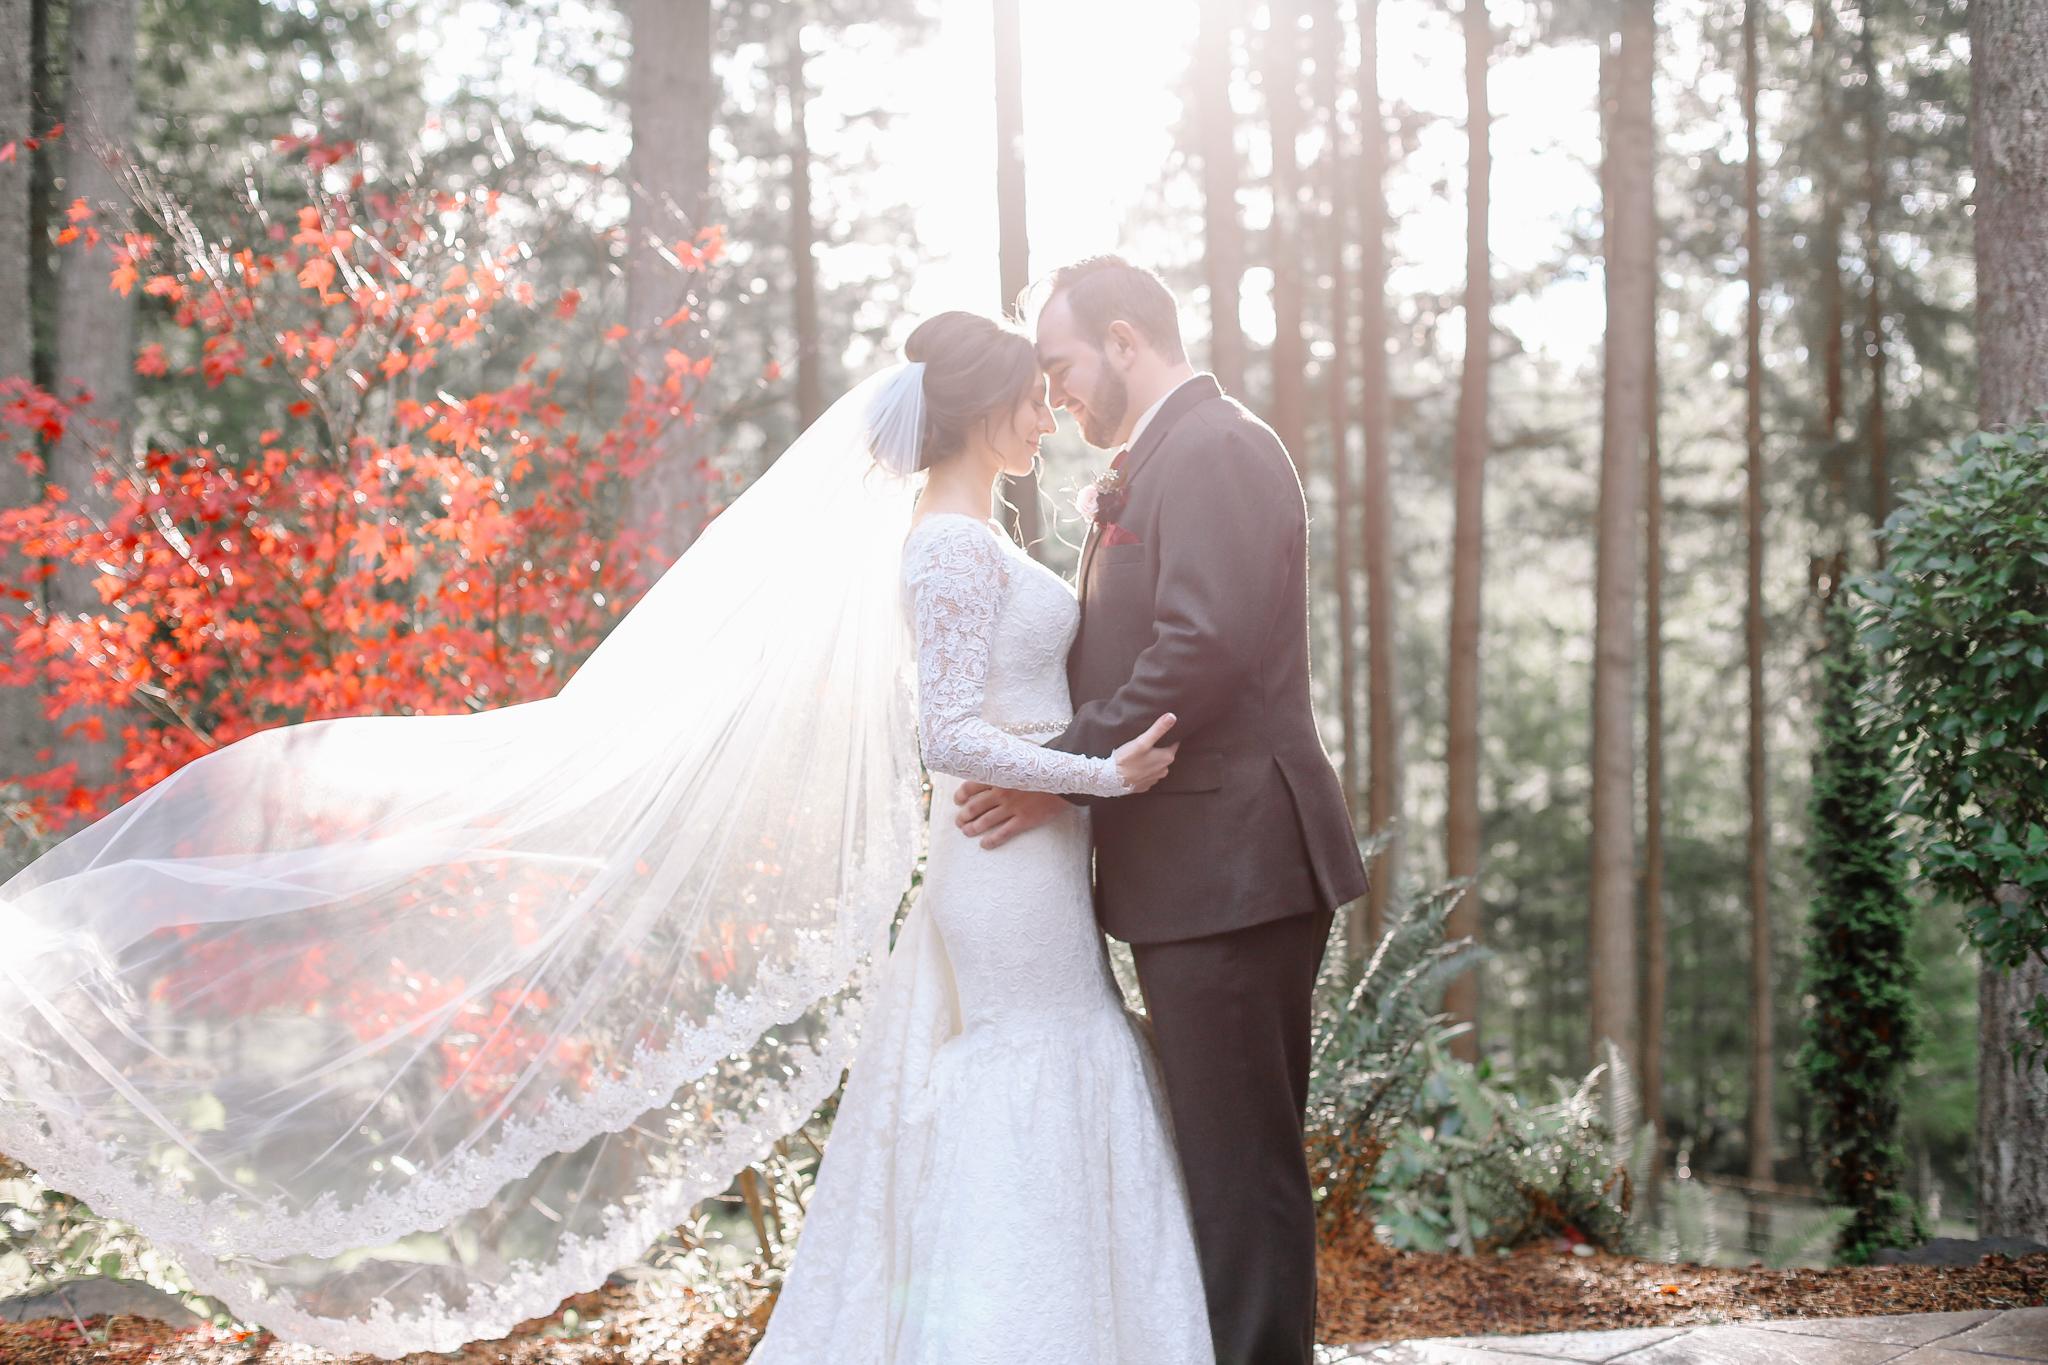 Manu and Laura - Portland Wedding Photographer - 34.jpg